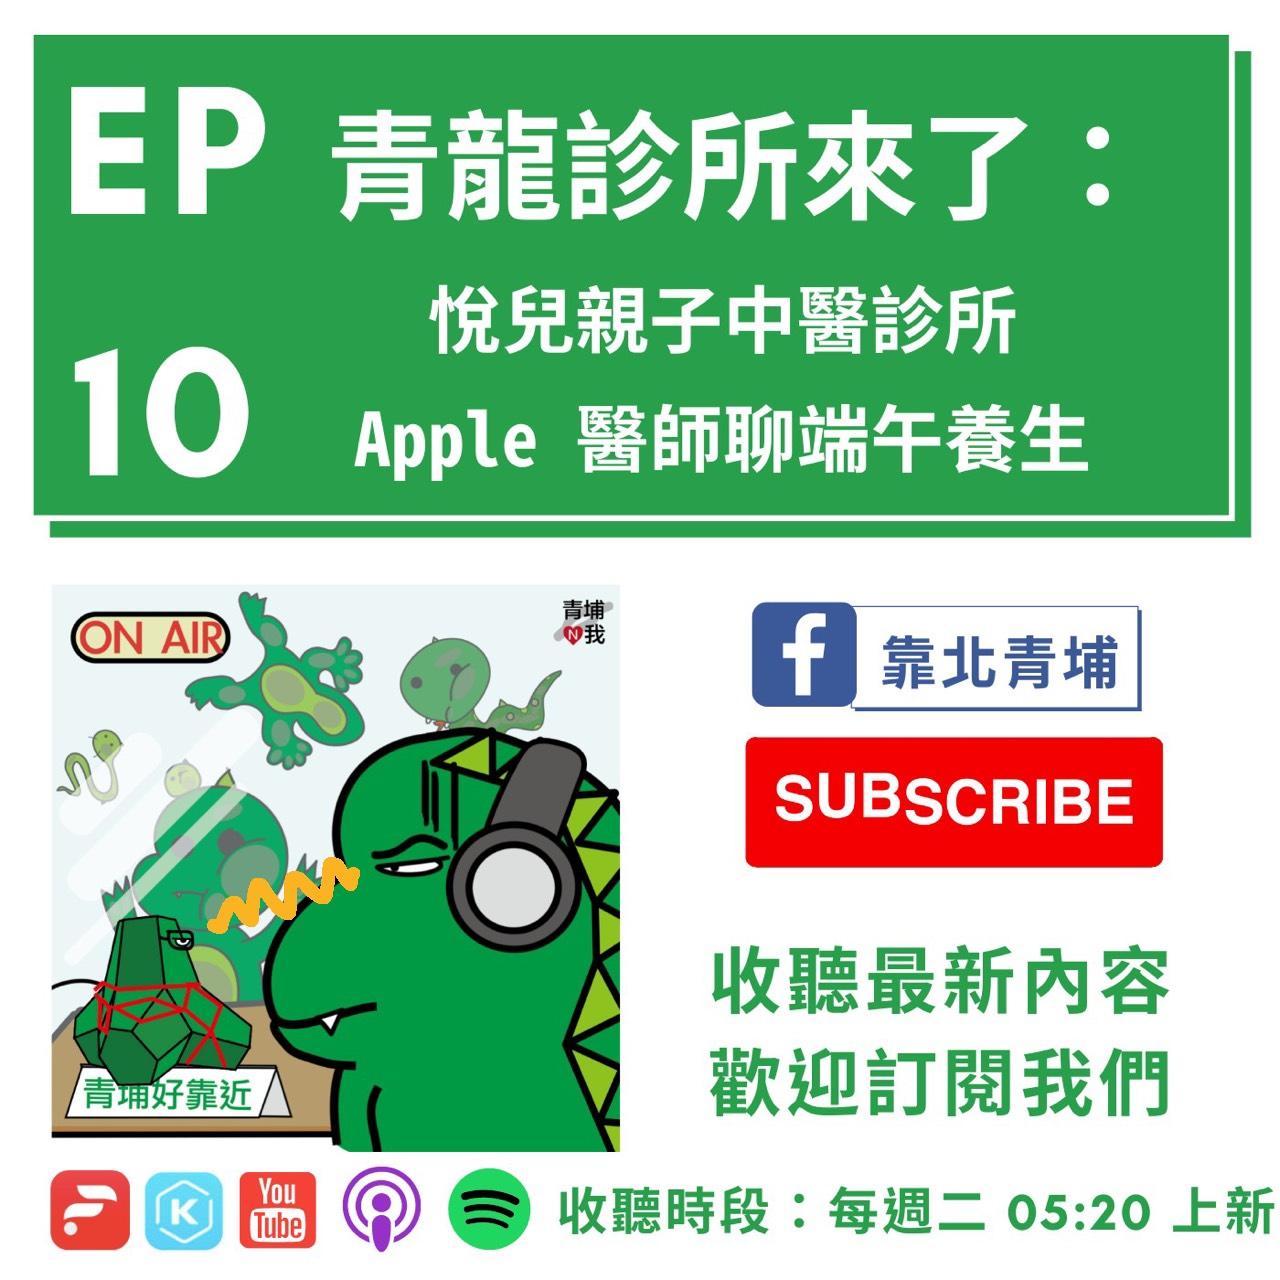 S1 EP10 - 青龍診所來了:青埔悅兒親子中醫診所 Apple 醫師聊端午養生